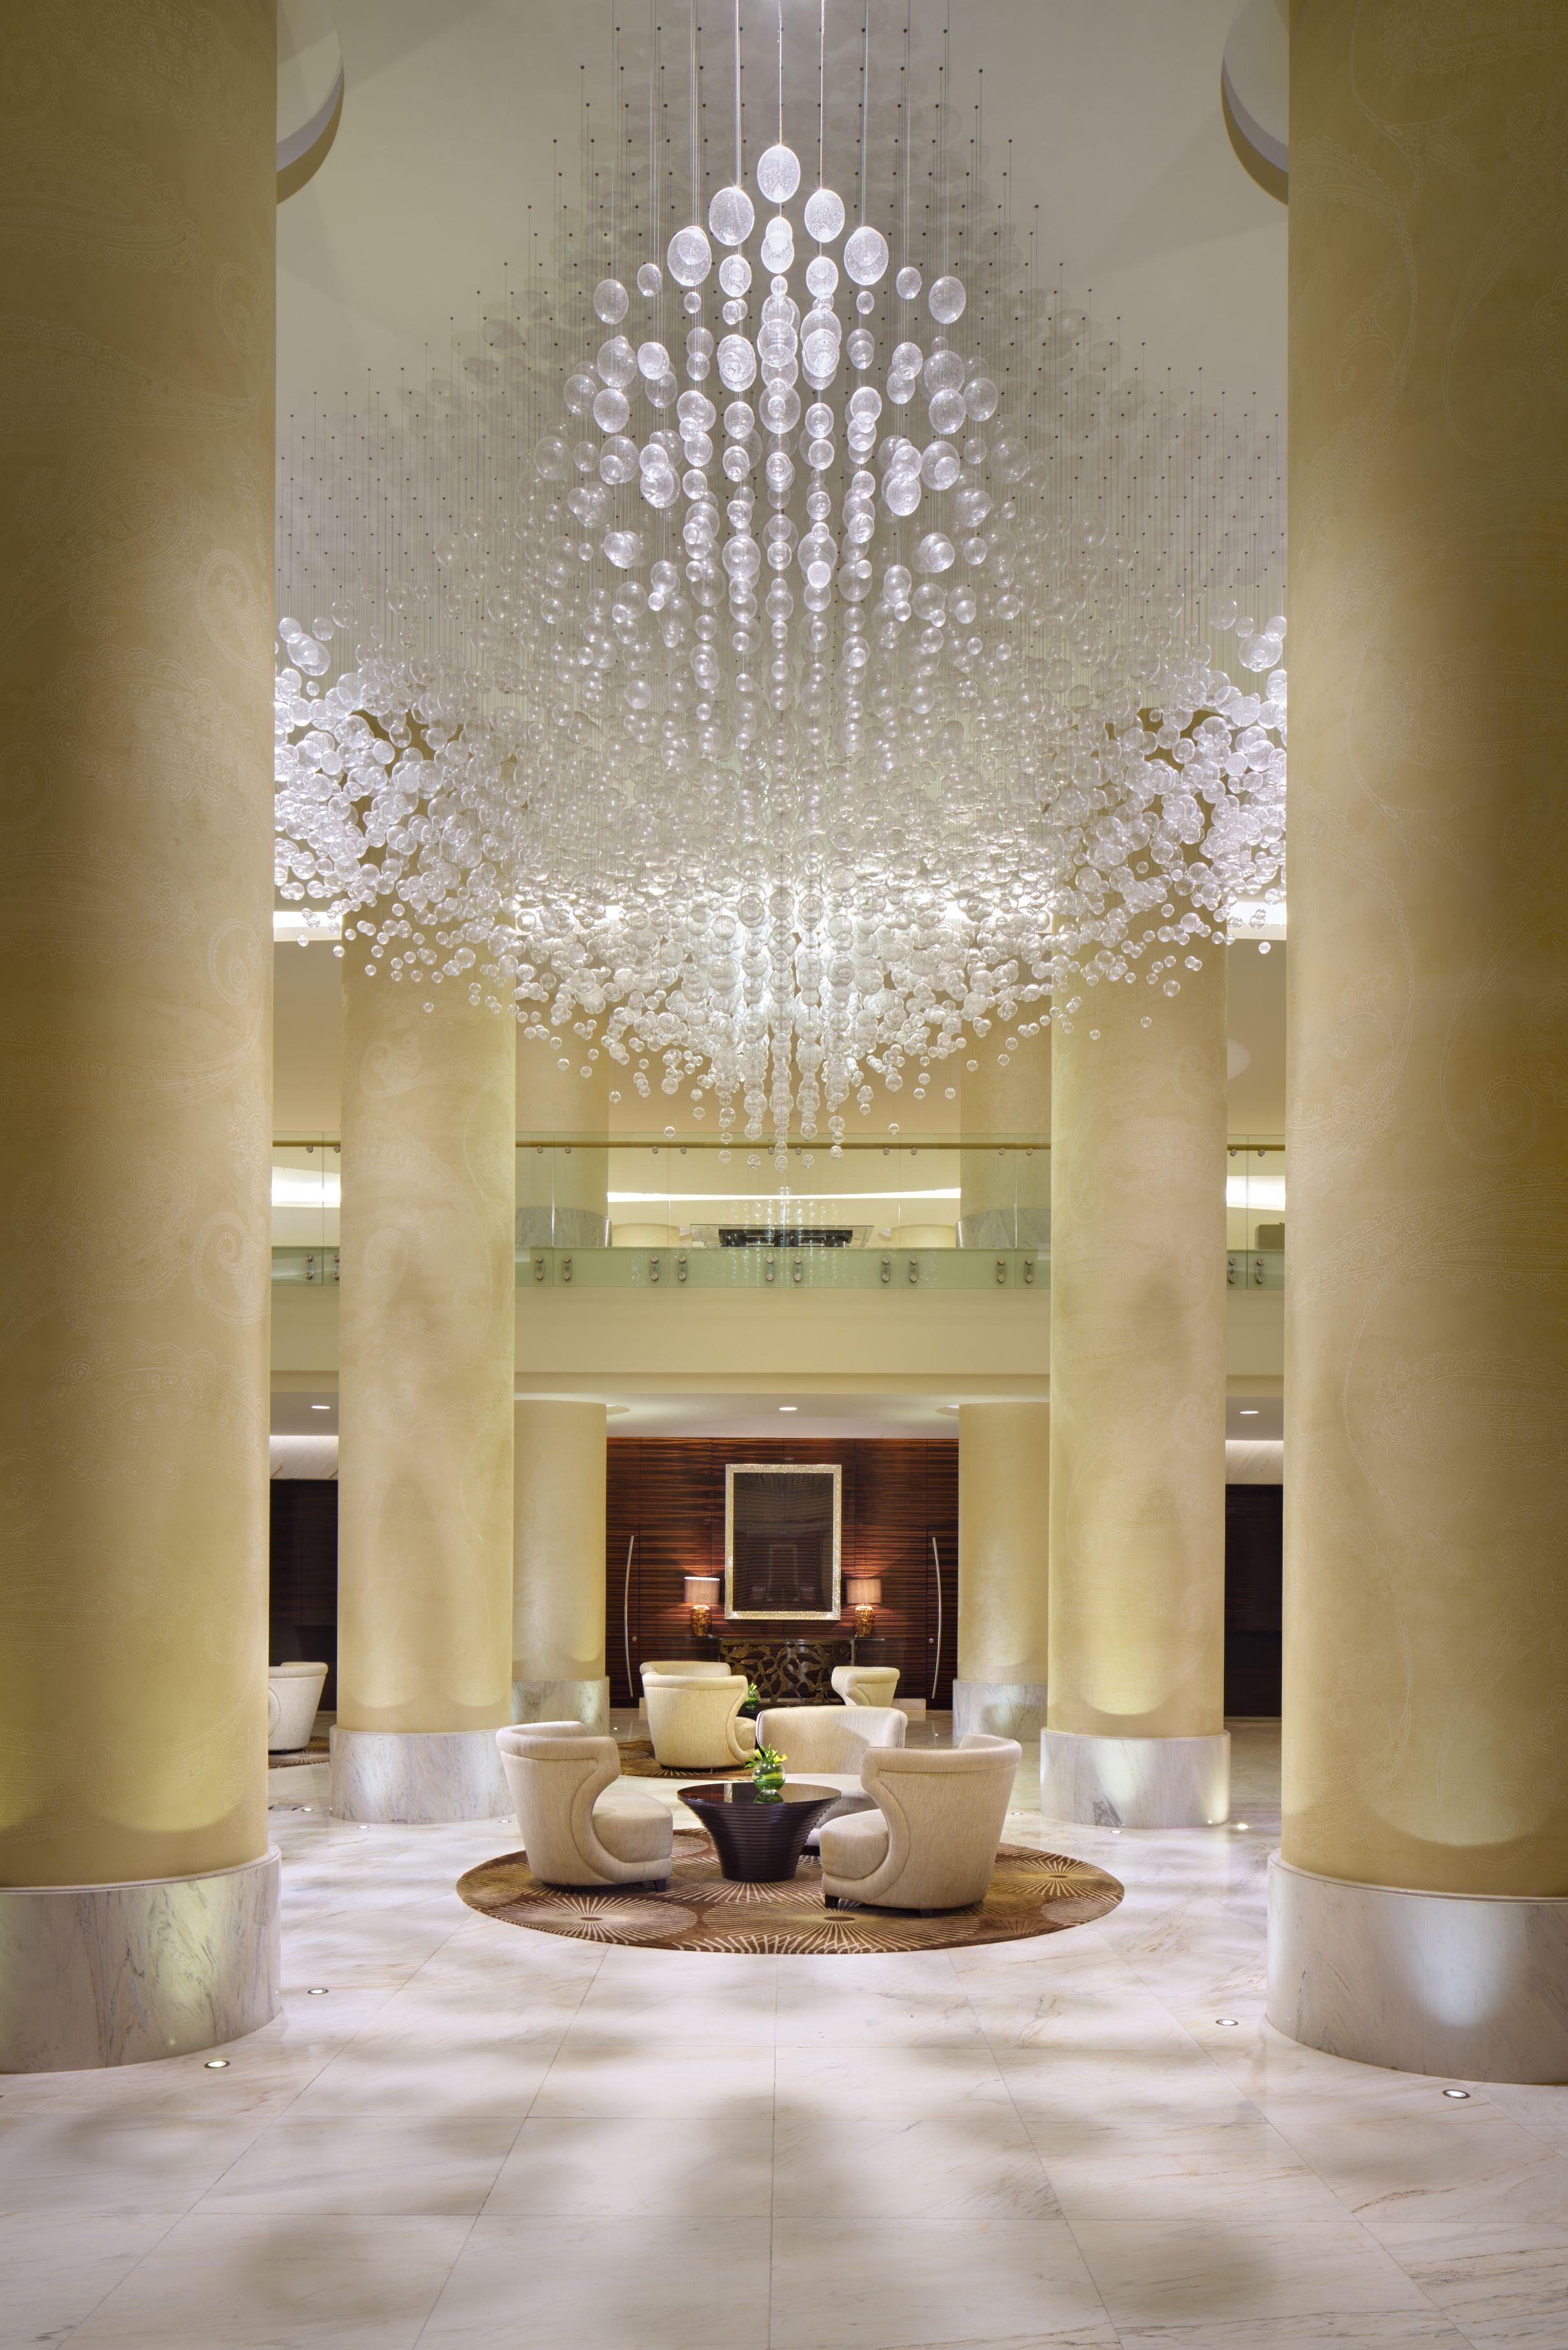 Jw Marriott Hotel Absheron Baku Jw Marriott Hotel Absheron Baku Is An Upscale Baku Hotel Ideally Located Among The City C Marriott Hotels Hotel Entrance Hotel